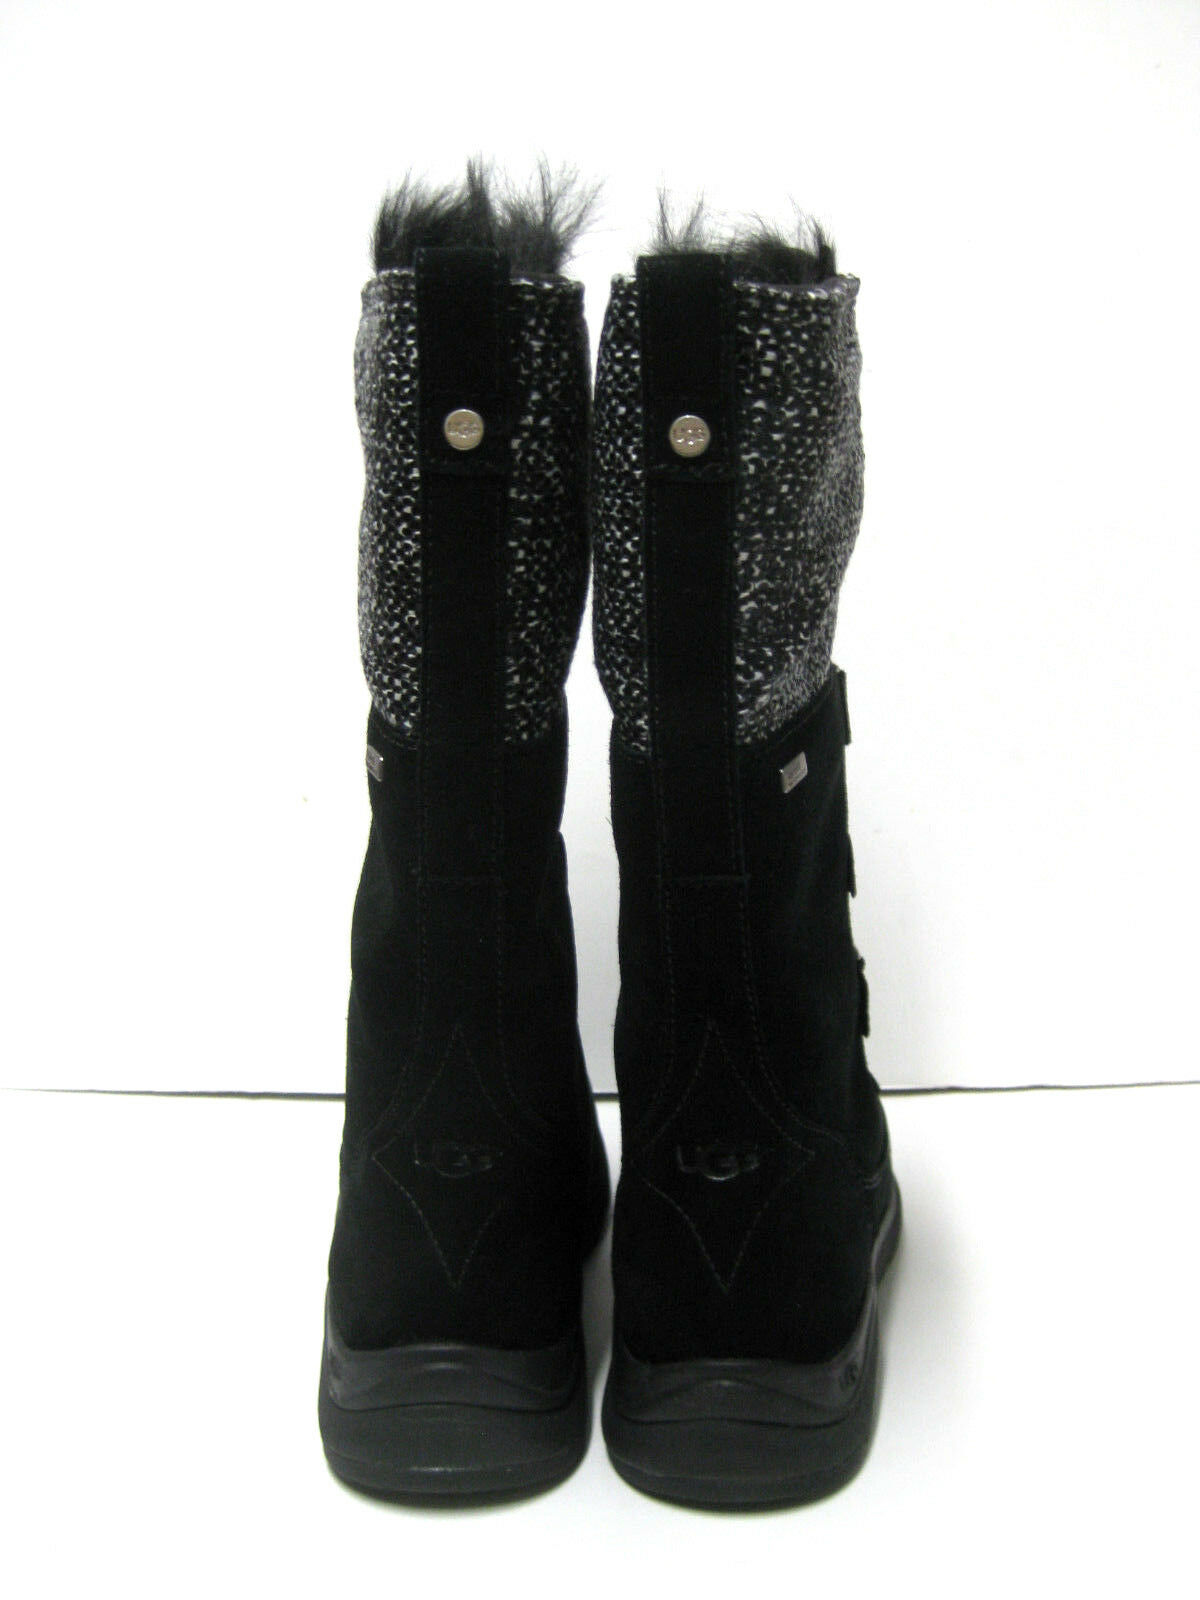 BY661 MOMA zapatos  zapatos MOMA negro cuero mujer botines c62ffd